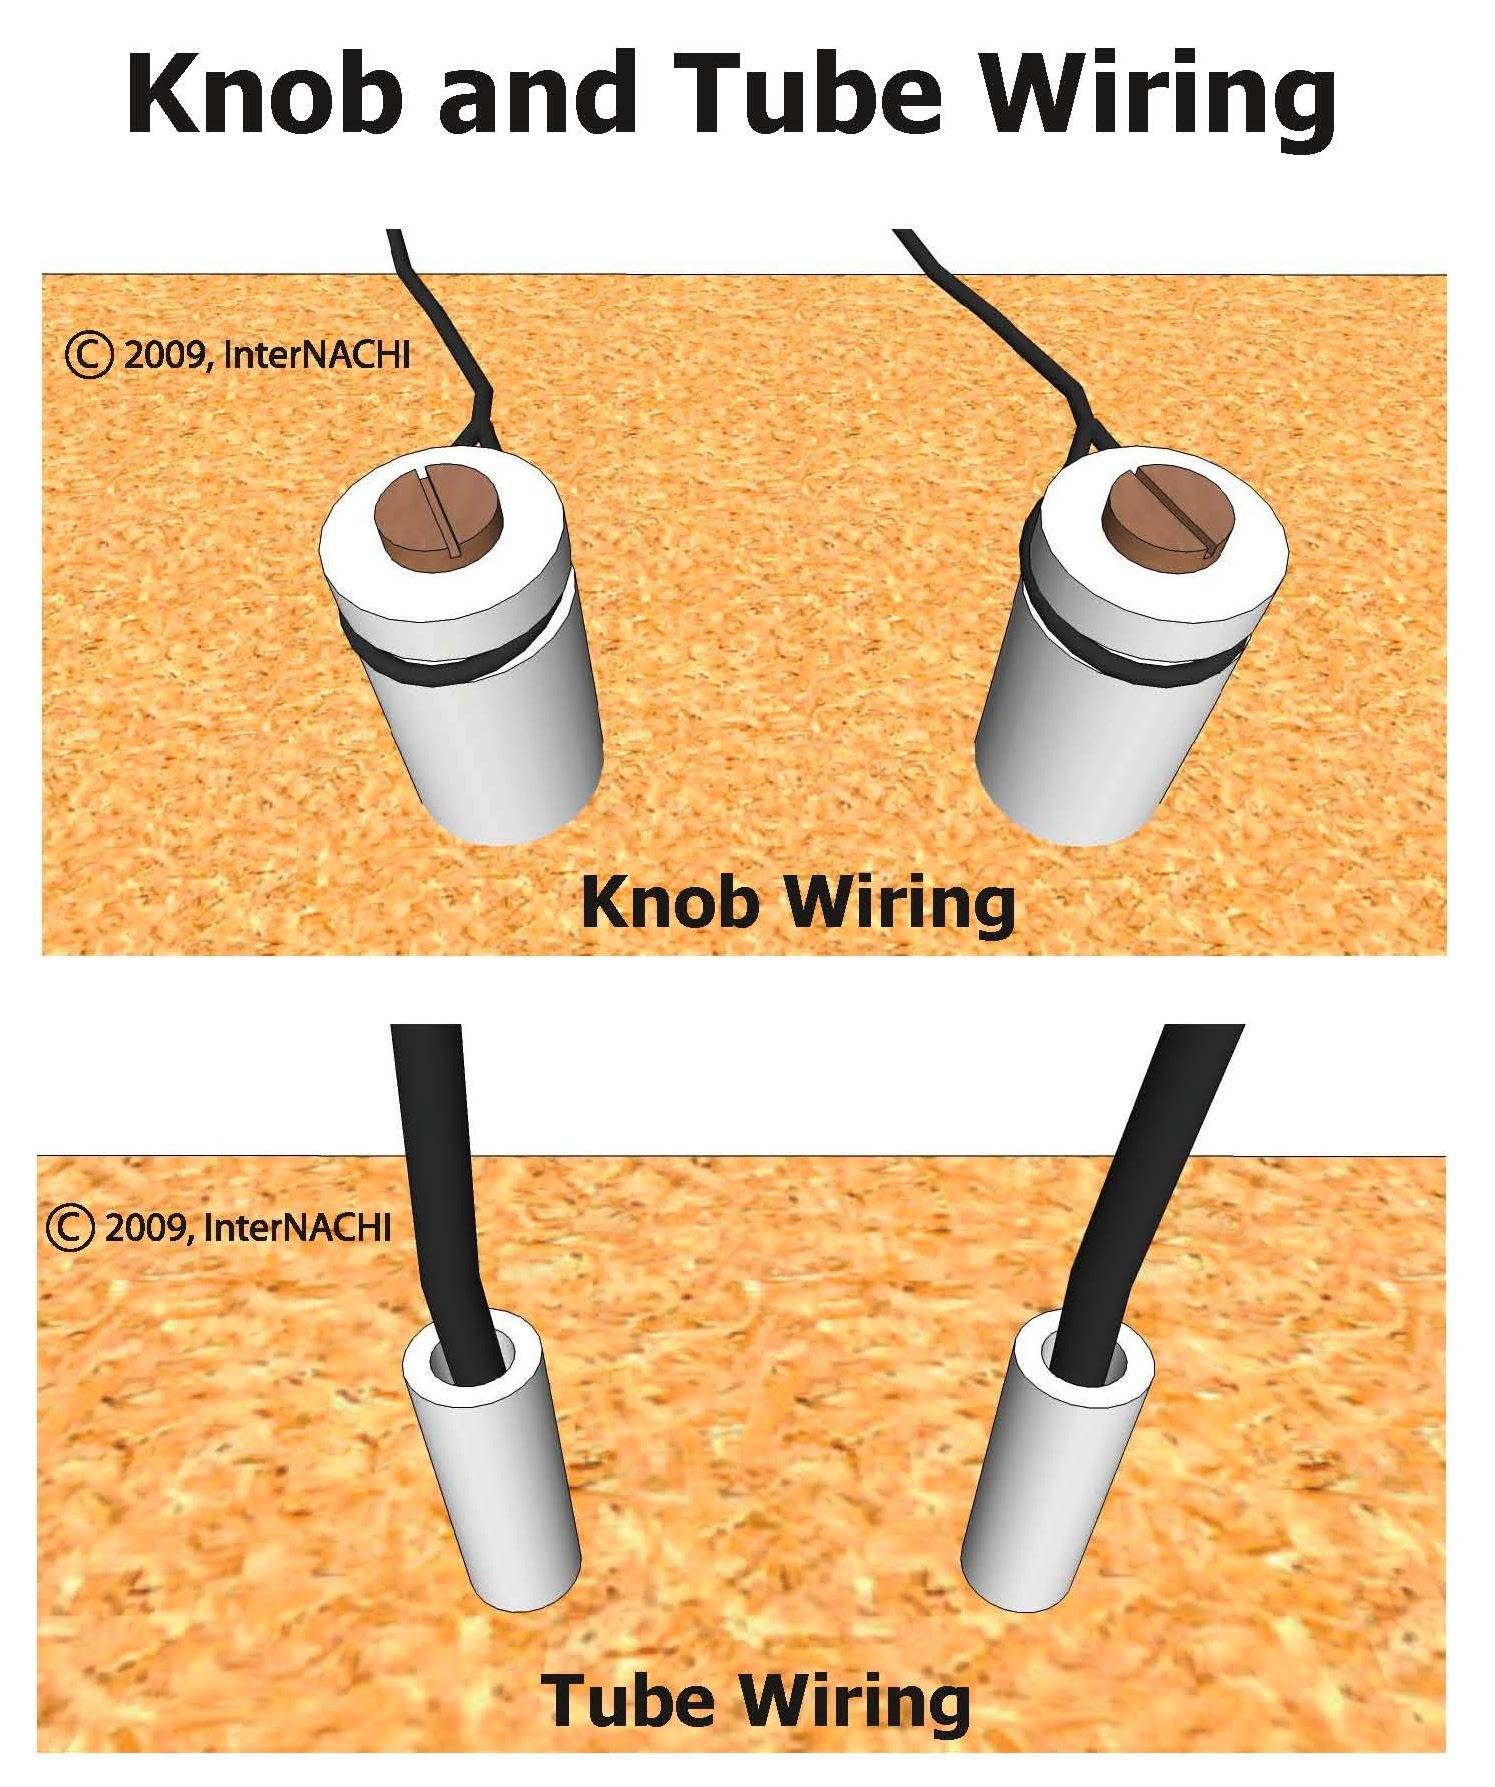 Knob and tube wiring.